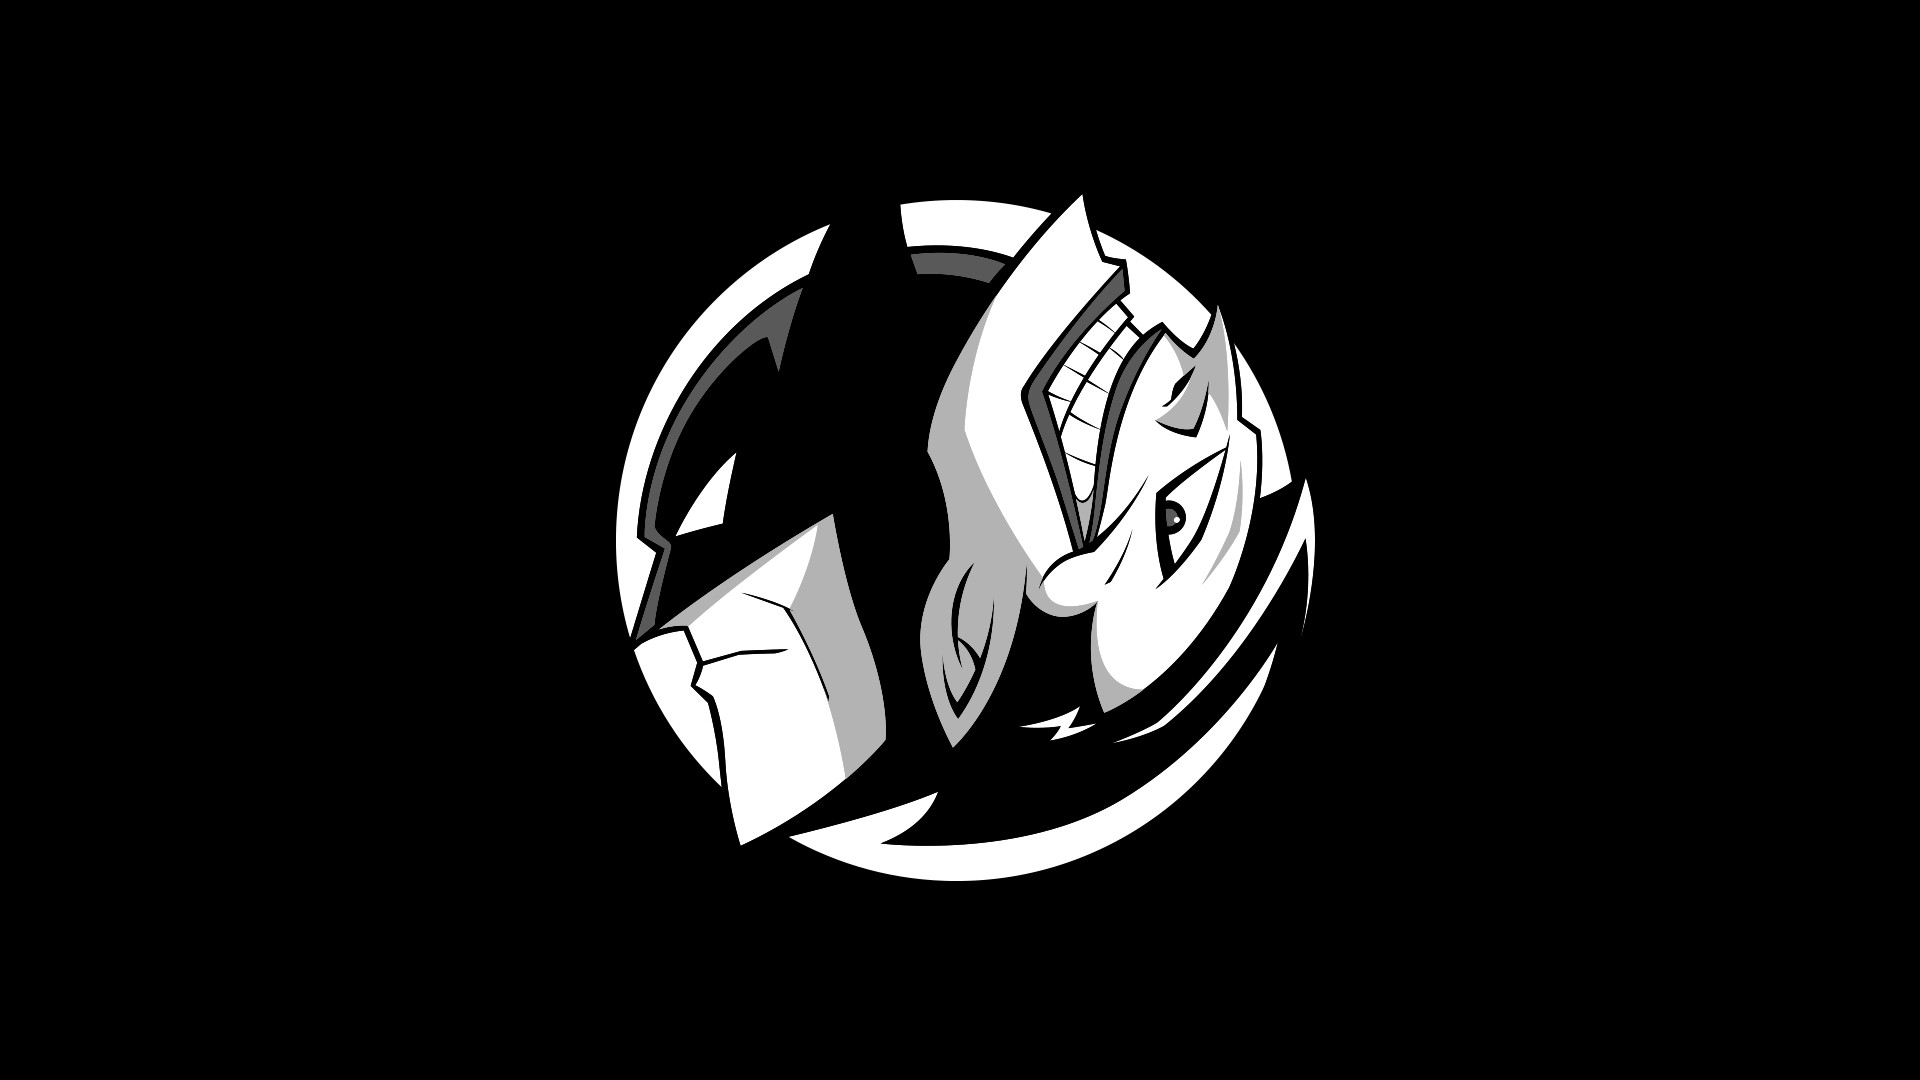 Gotham Yin Yang wallpaper …